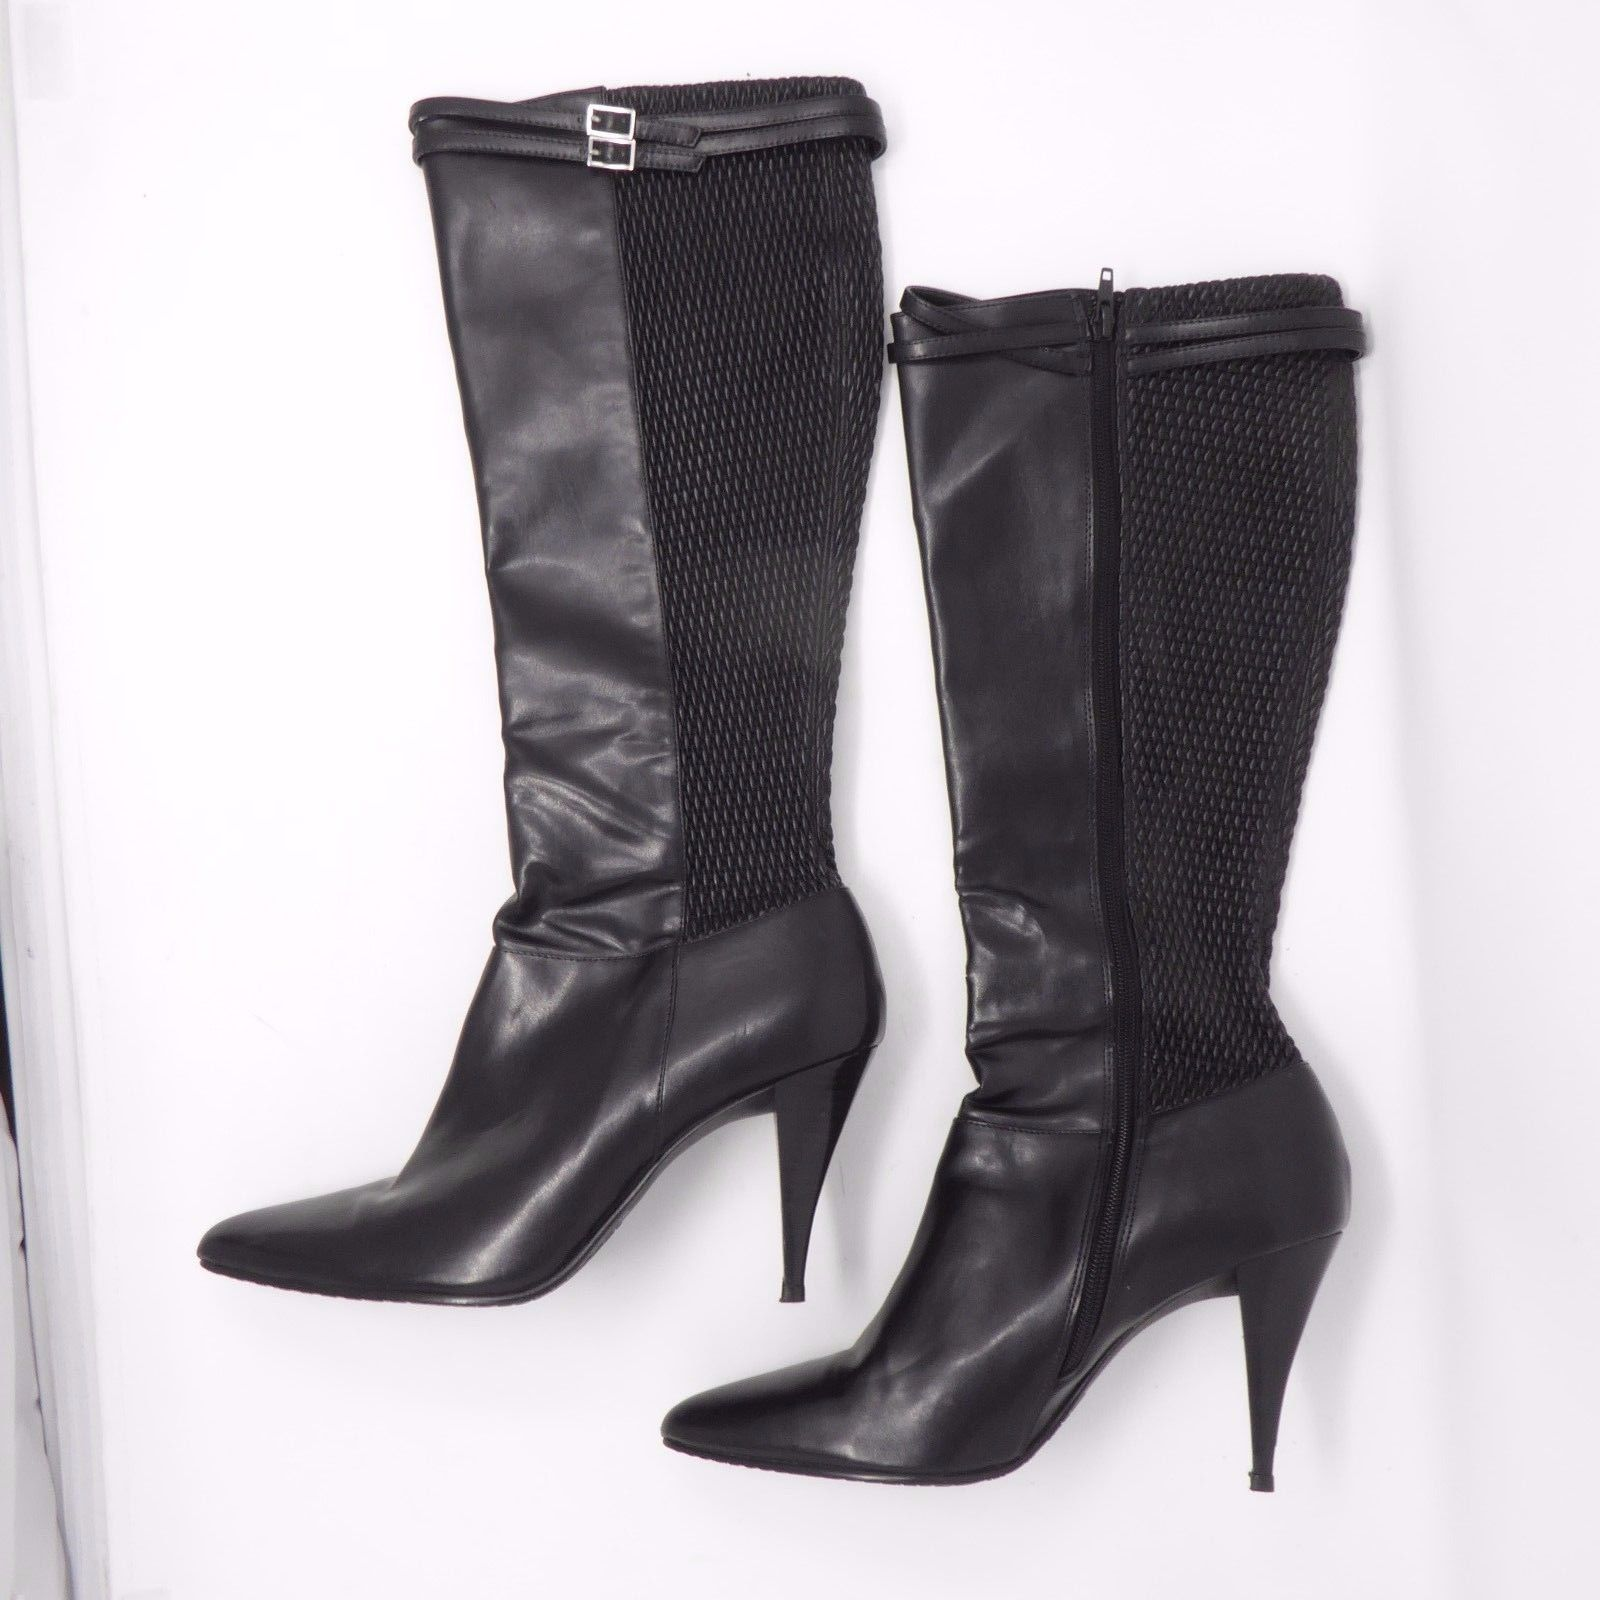 284d0451e20 S l1600. S l1600. Previous. Calvin Klein Women s Riana Leather Stretch Knee  18